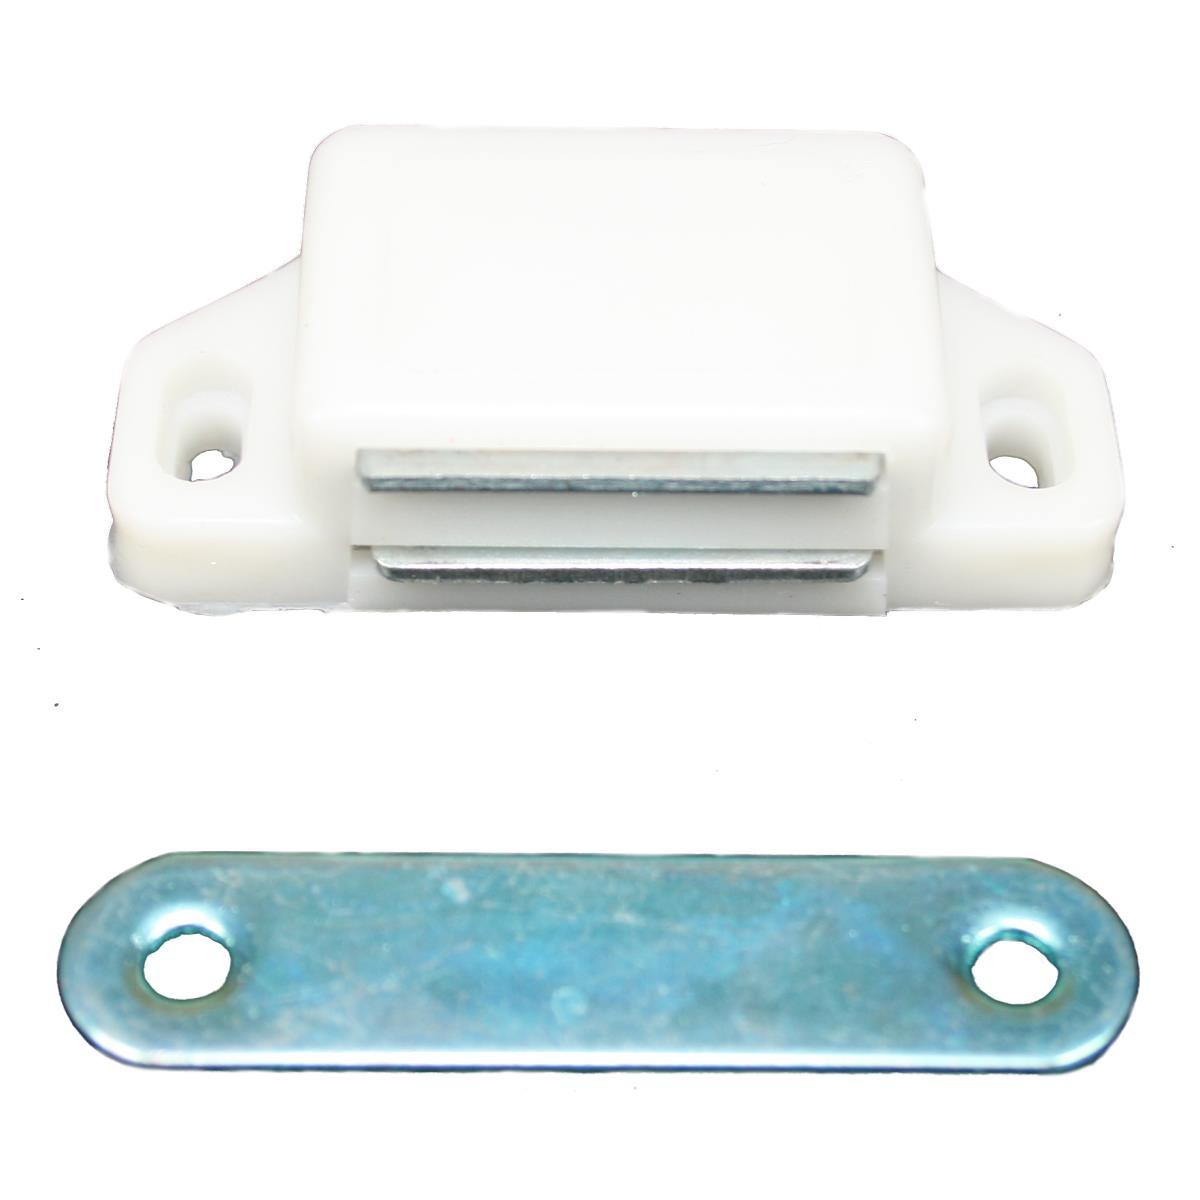 10 Magnetschnäpper Schrank Türmagnet Magnet-Schnapper Möbelmagnet Weiss,Vagner SDH,CL3130, 2000511730135